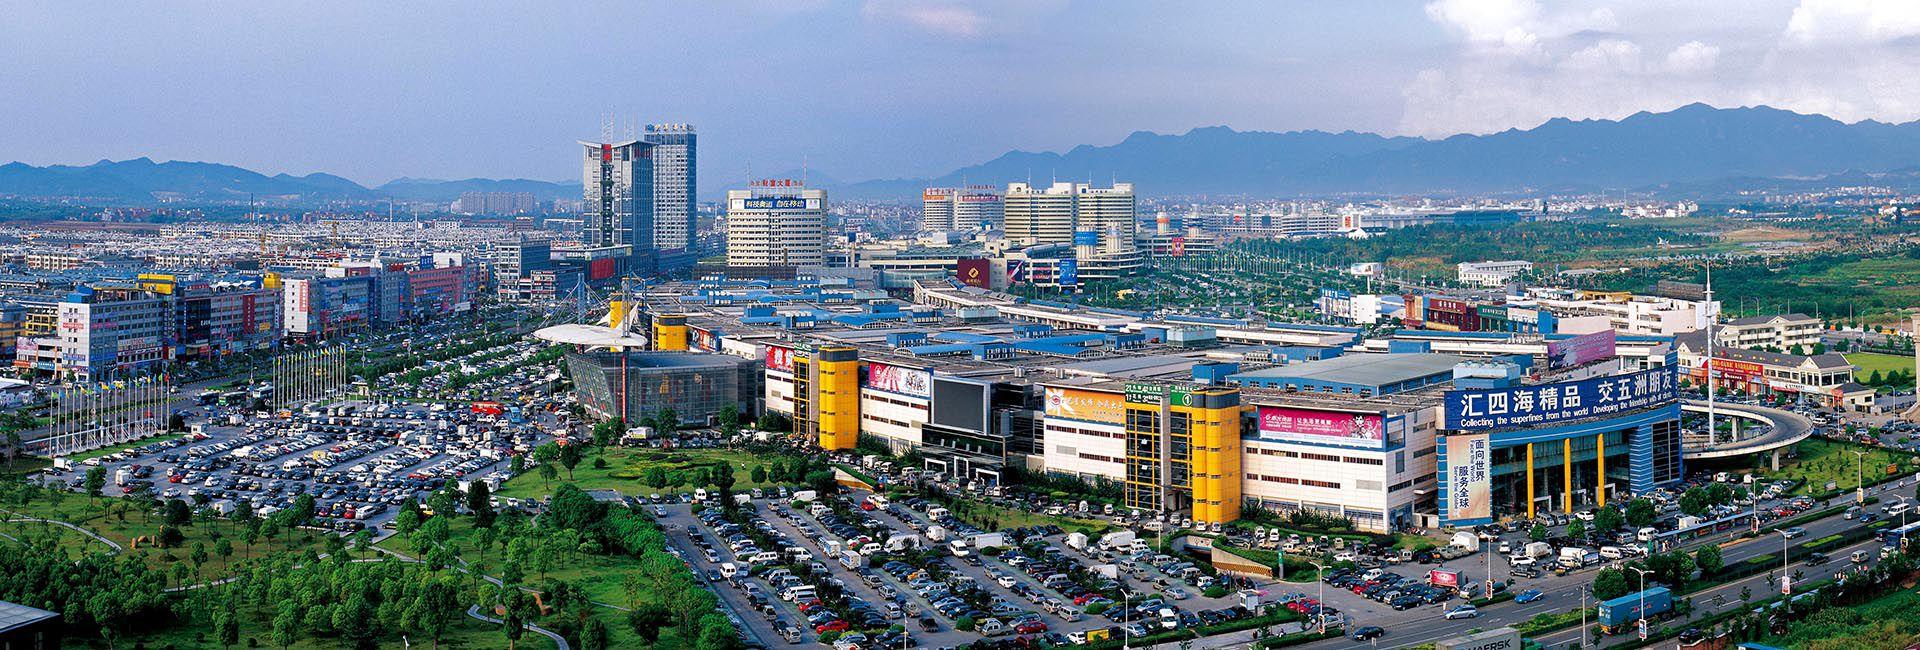 Yiwu Int'l Trade City